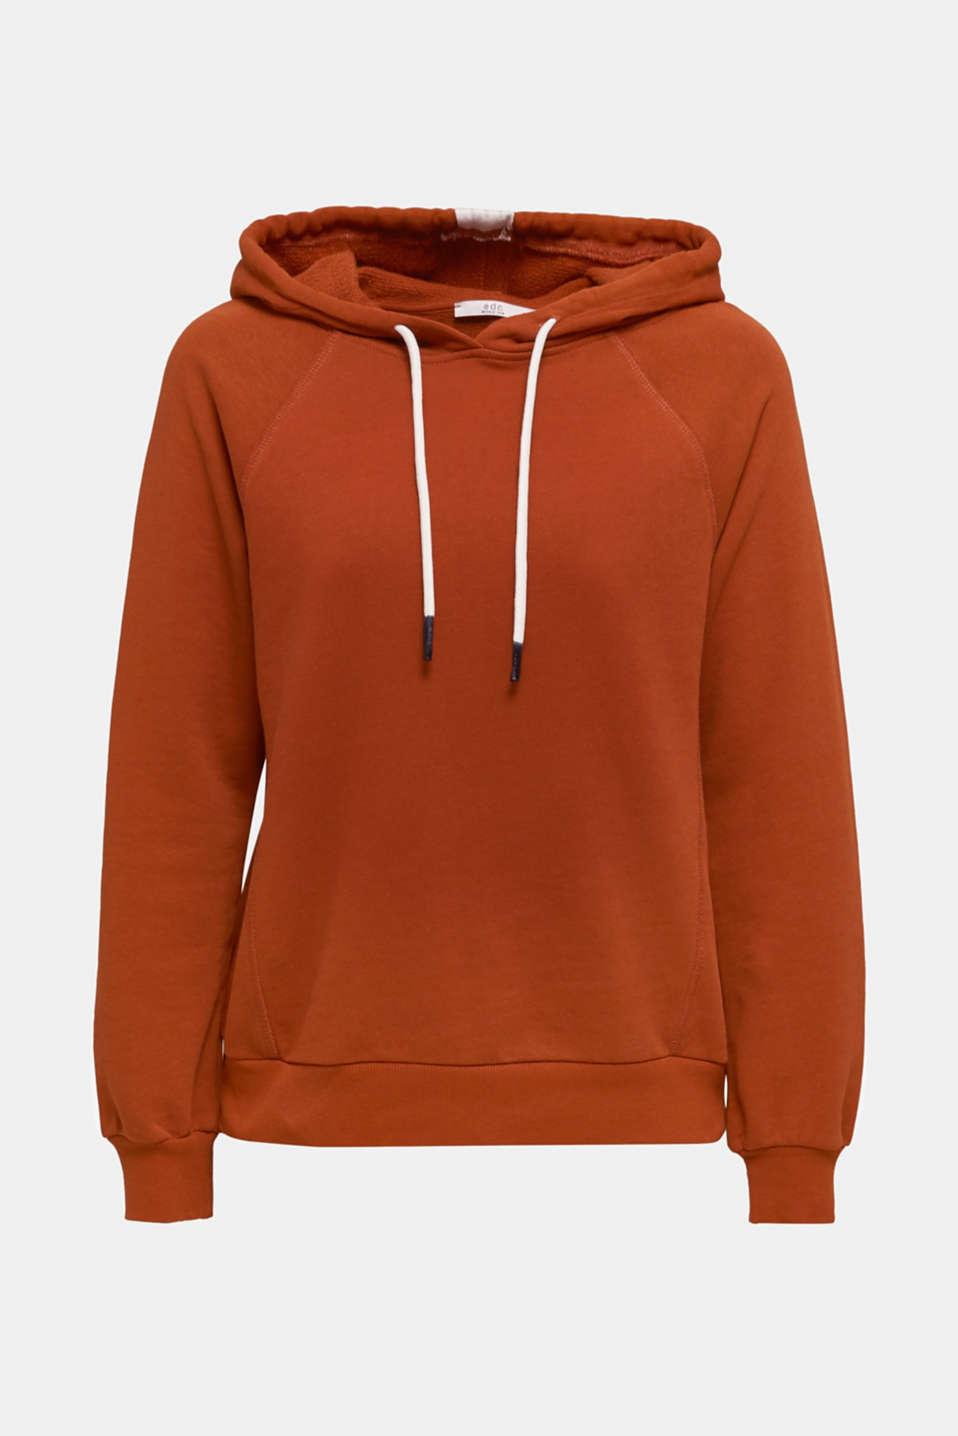 Logo tape detail hoodie, 100% cotton, CINNAMON, detail image number 7